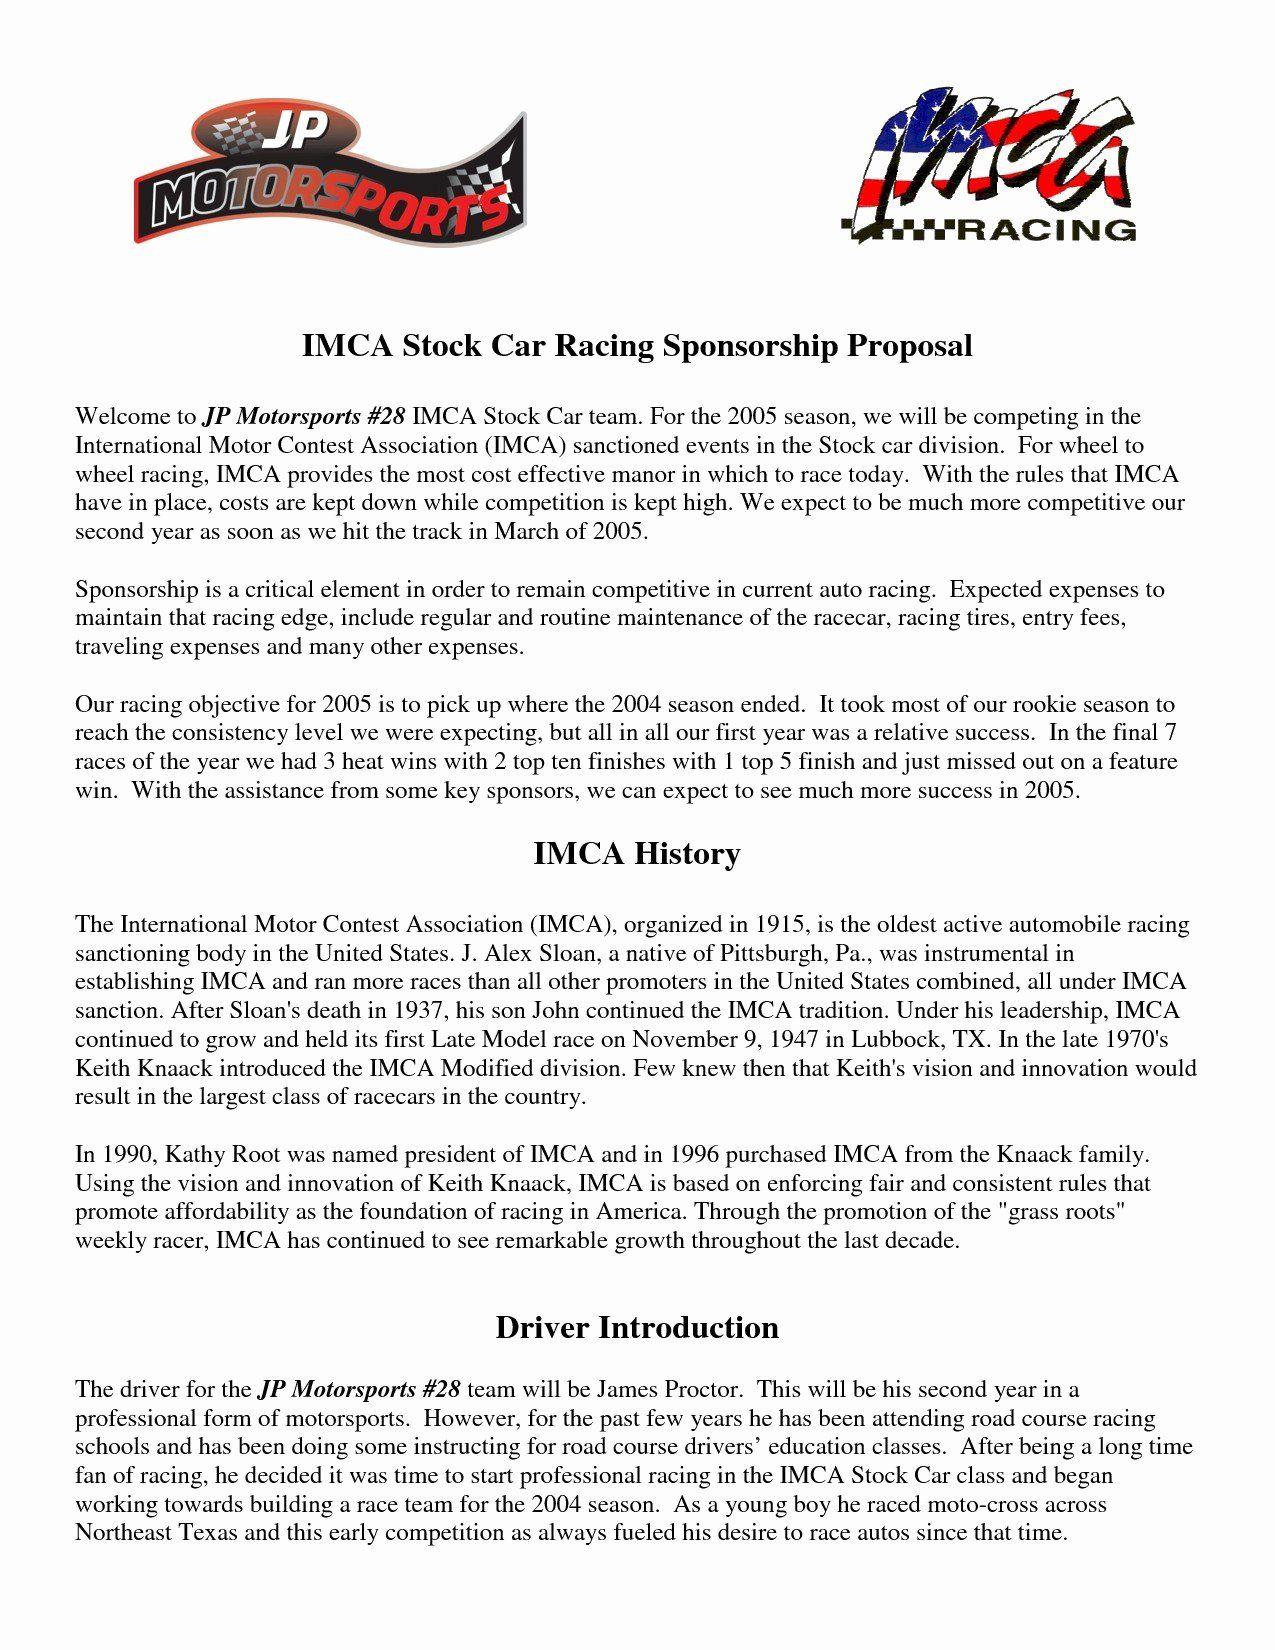 Sports Team Sponsorship Proposal Template Lovely Sponsorship Proposal Letter Template Collection Sponsorship Proposal Proposal Templates Sponsorship Letter Race car sponsorship proposal template